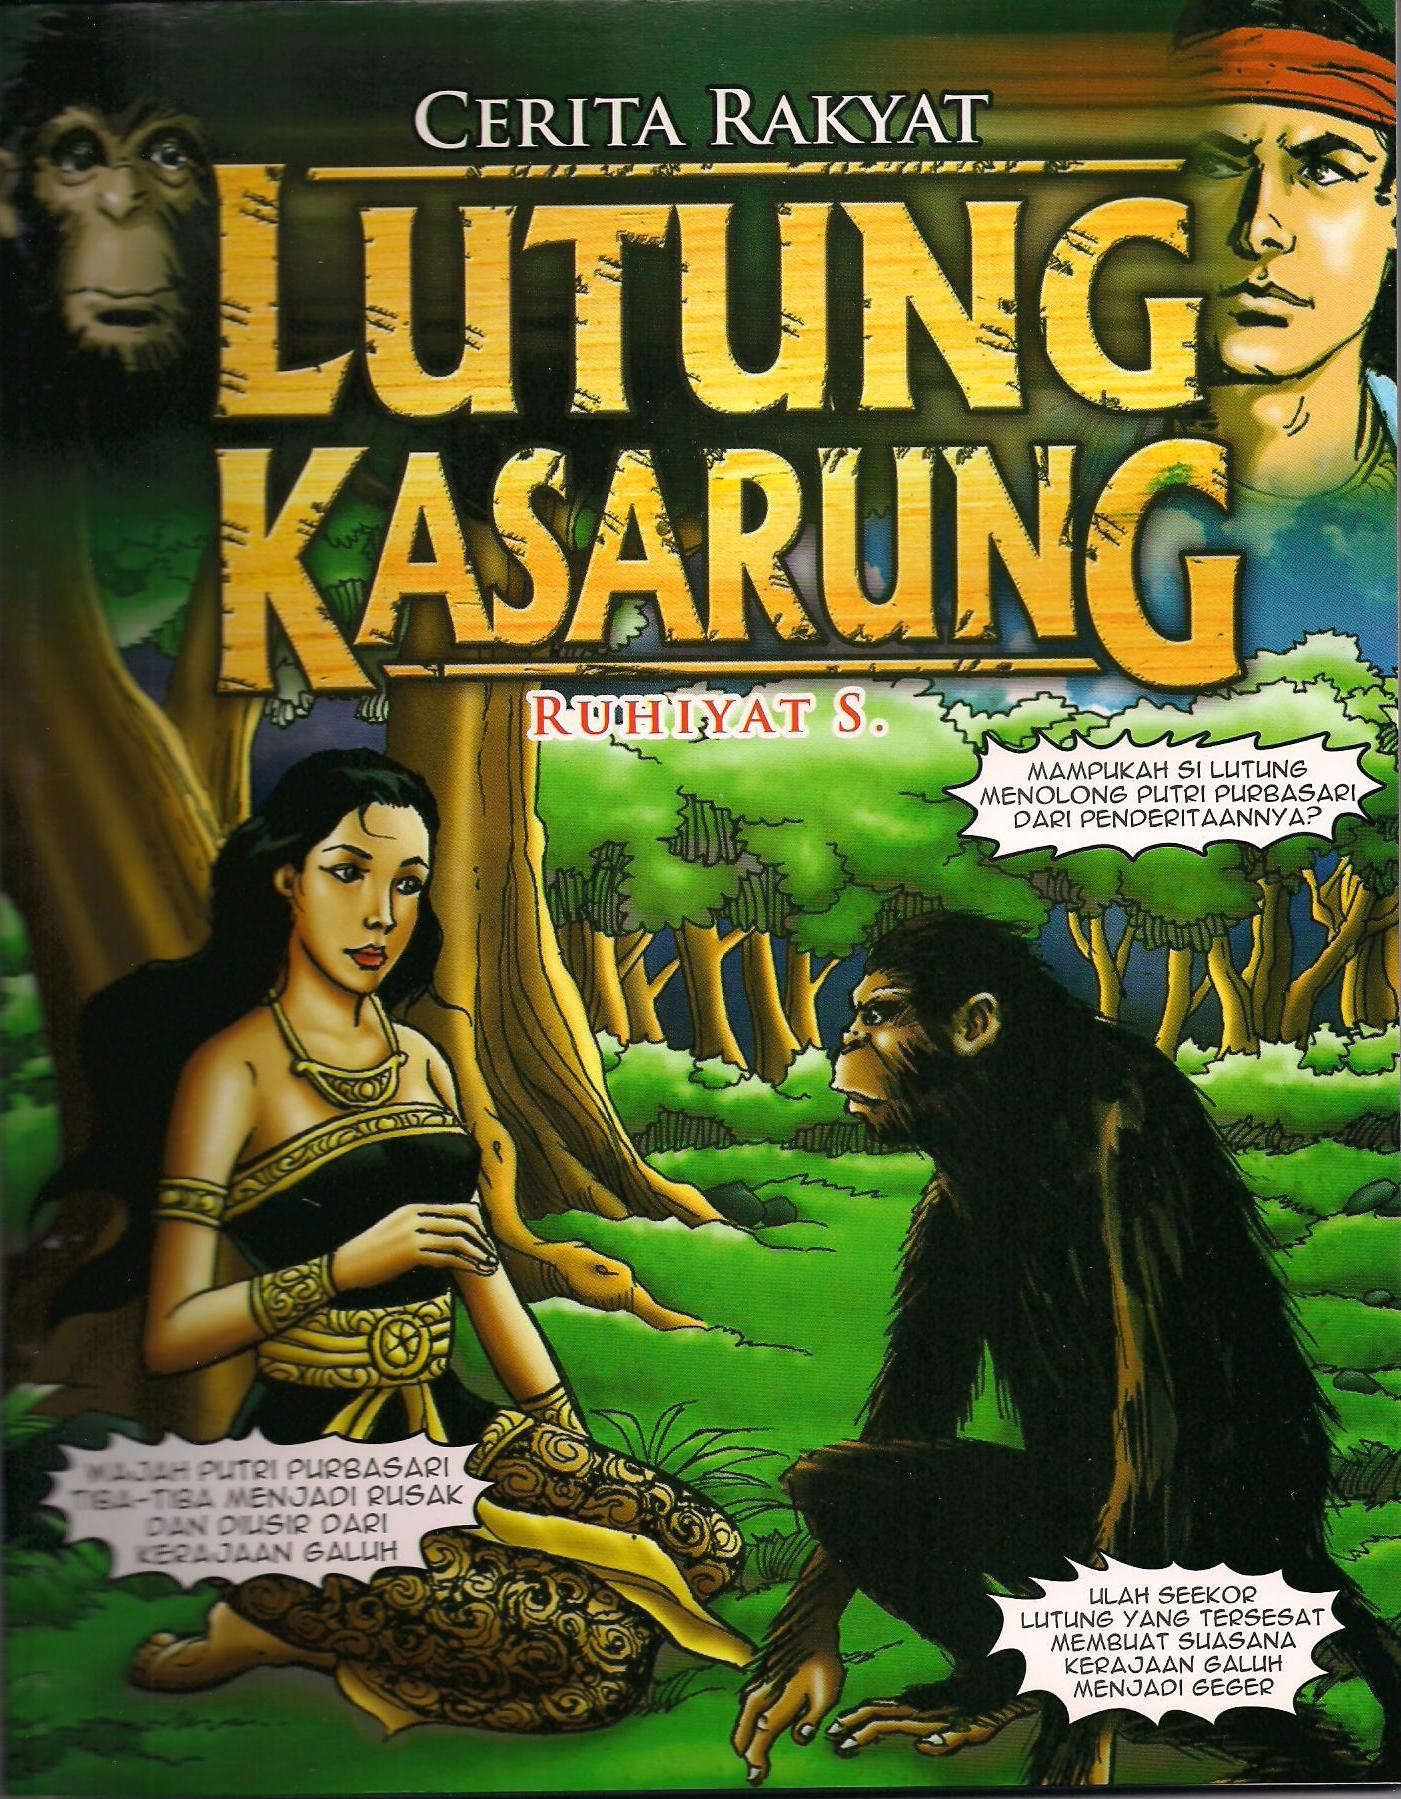 Katalog Buku Cerita Rakyat Indonesia Indonesian Education And